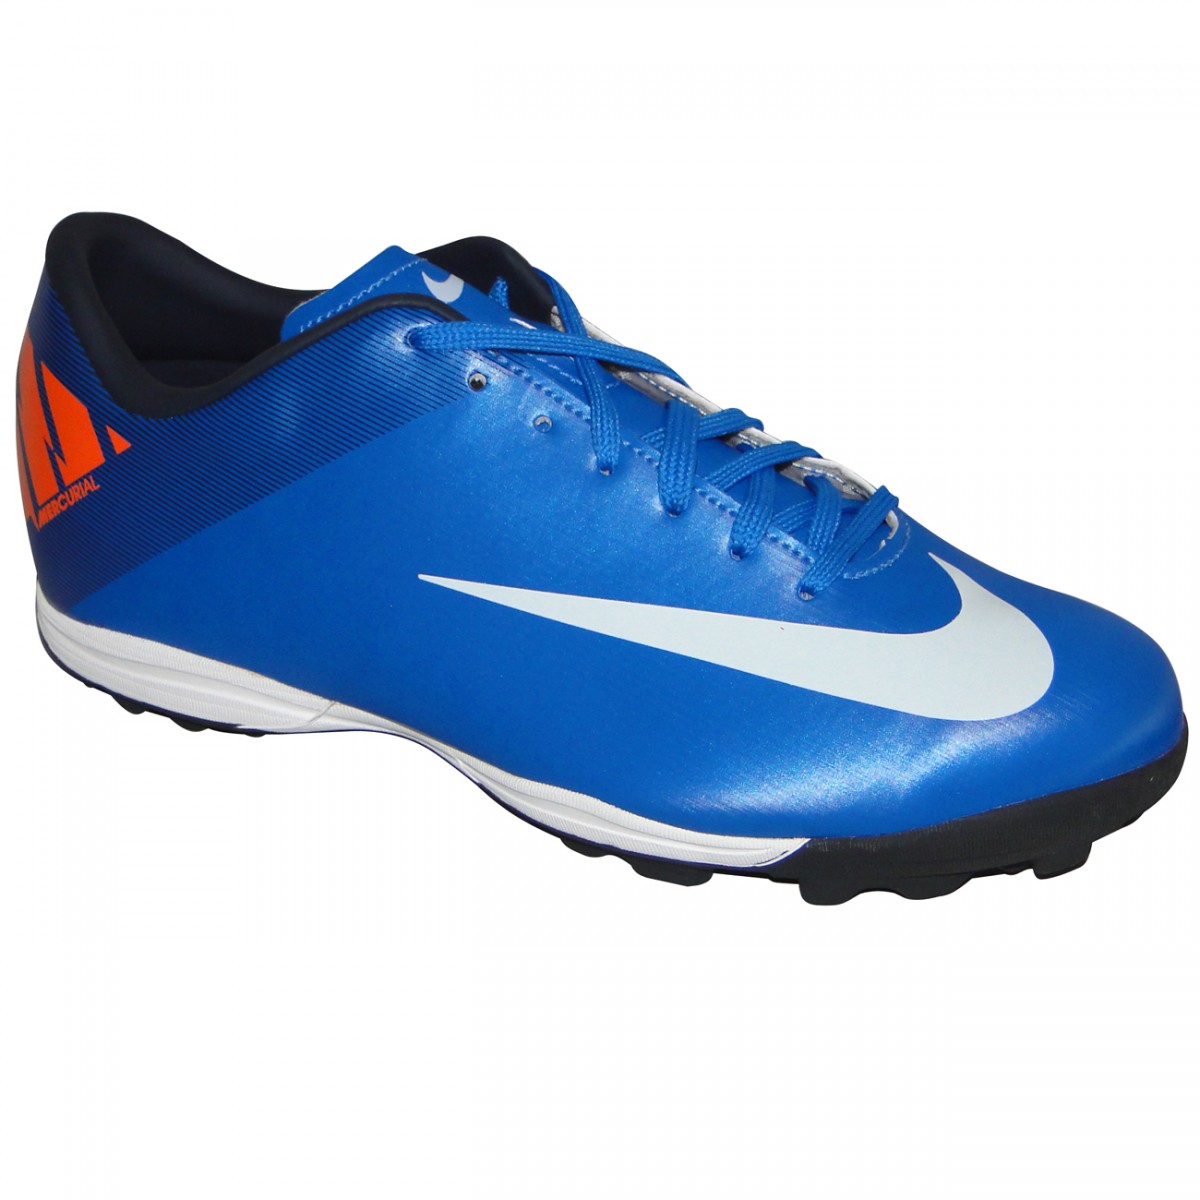 8c20a5de002d1 Chuteira Society Nike Mercurial Victory Ii 8895 - AZUL - Chuteira Nike,  Adidas. Sandalias Femininas. Sandy Calçados